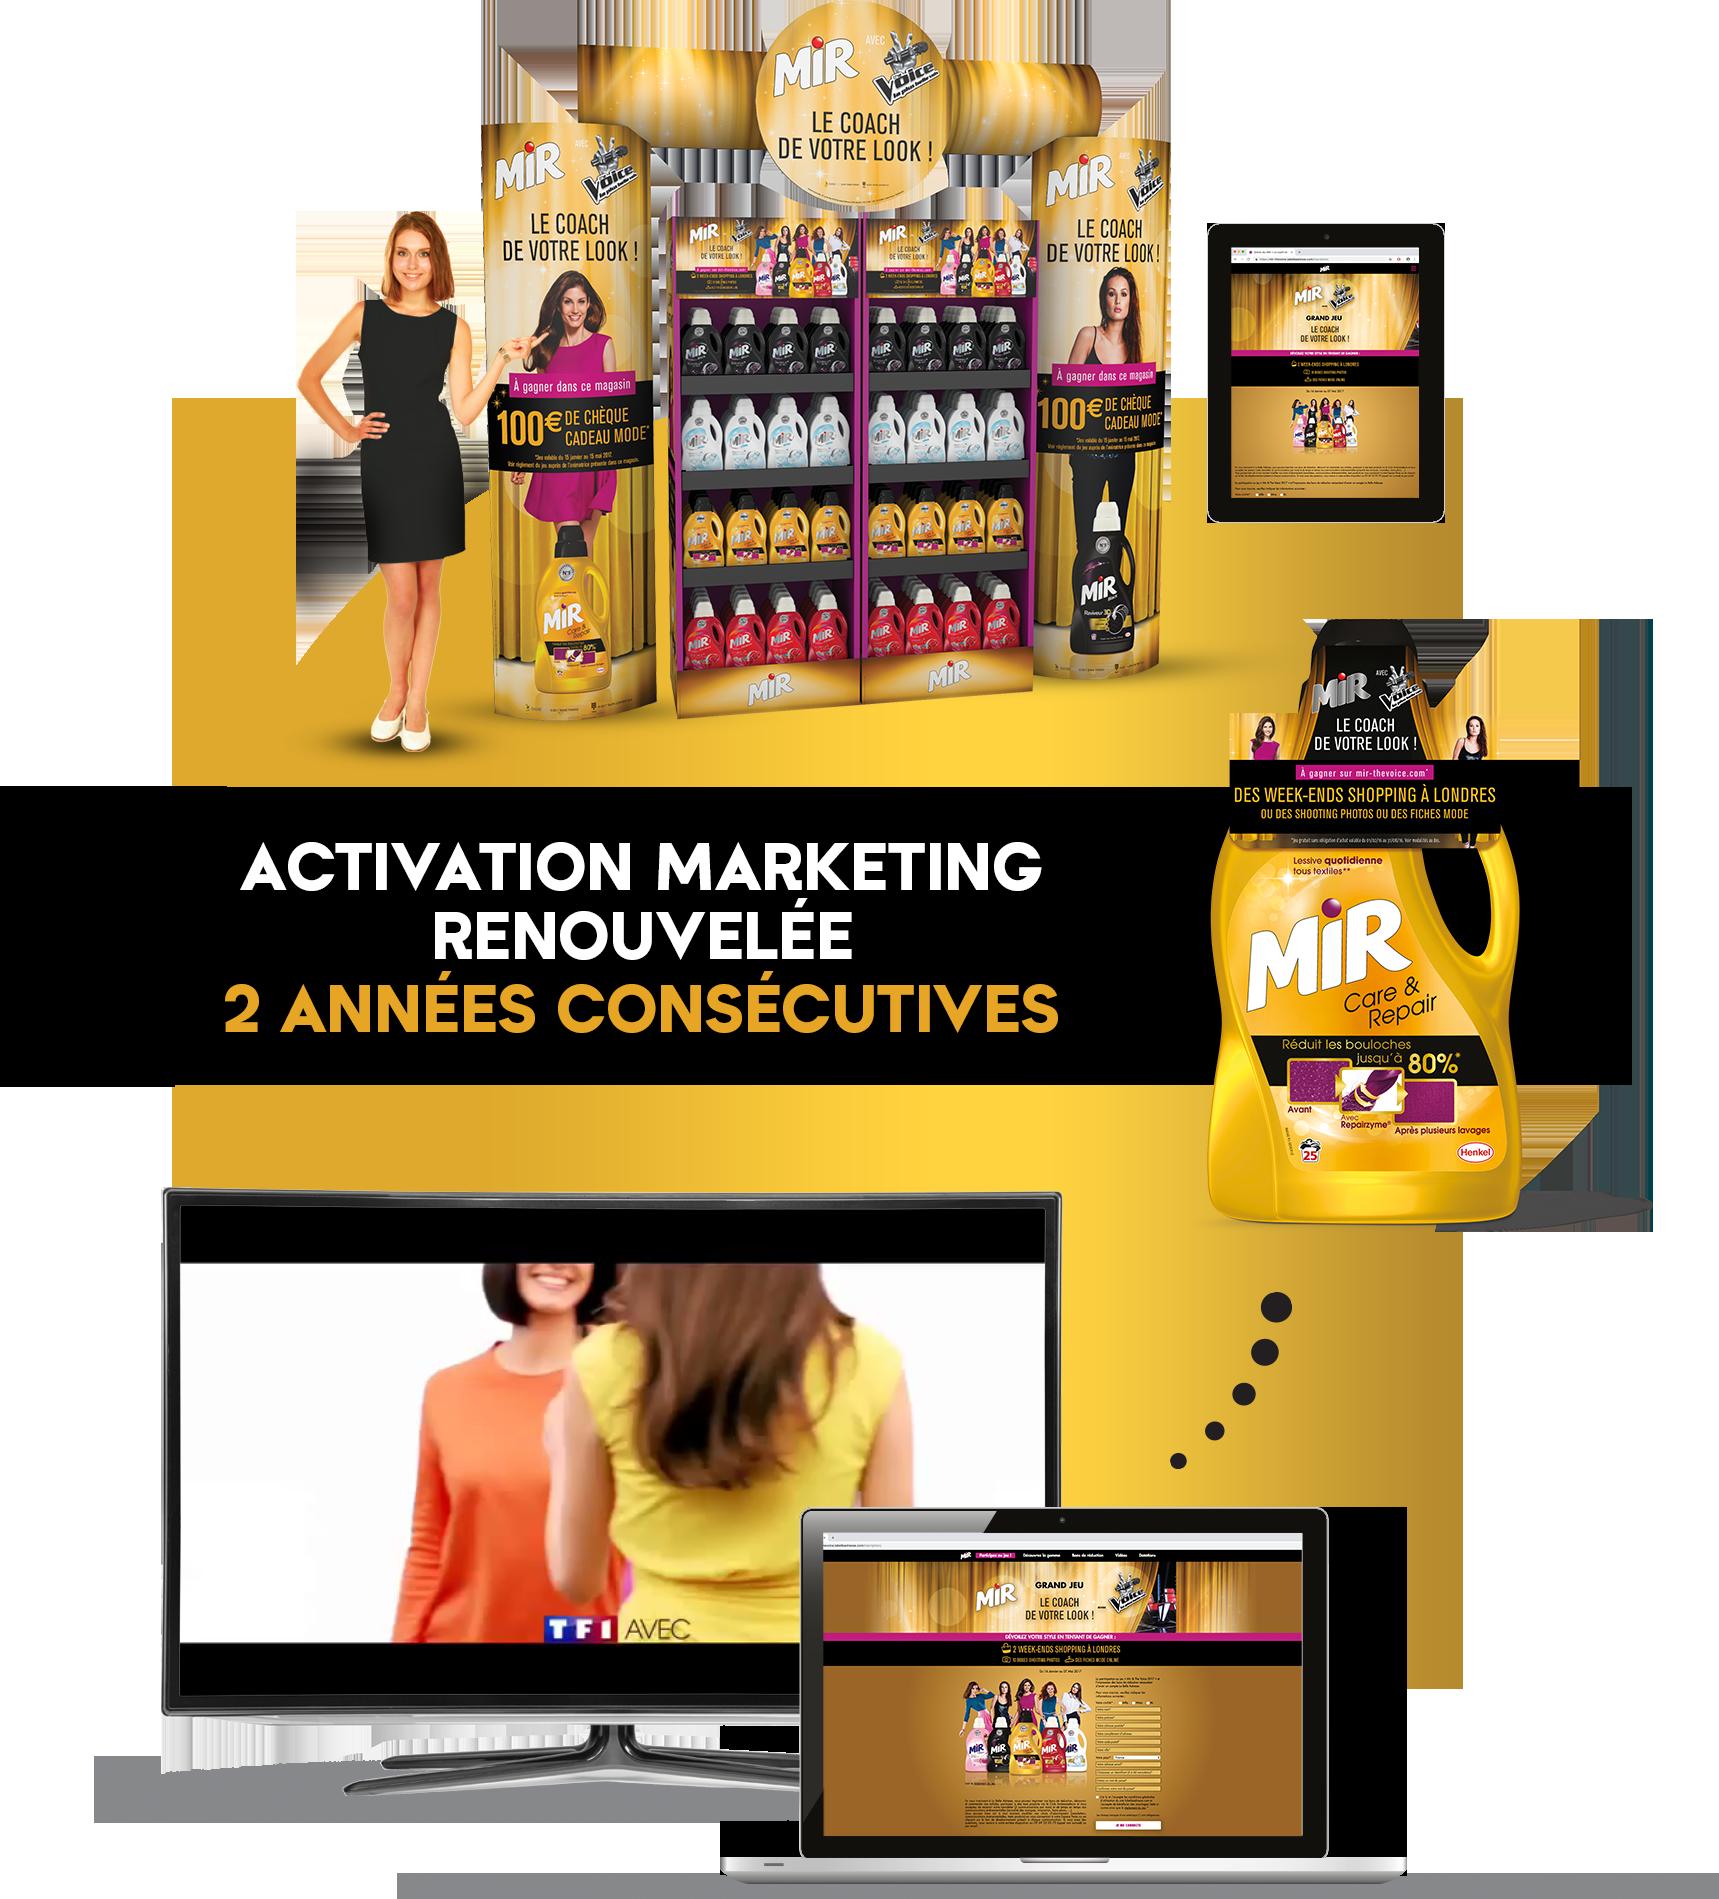 Agence communication Rangoon - promotion des ventes shopper licencing 360 The Voice Henkel Mir Lessives